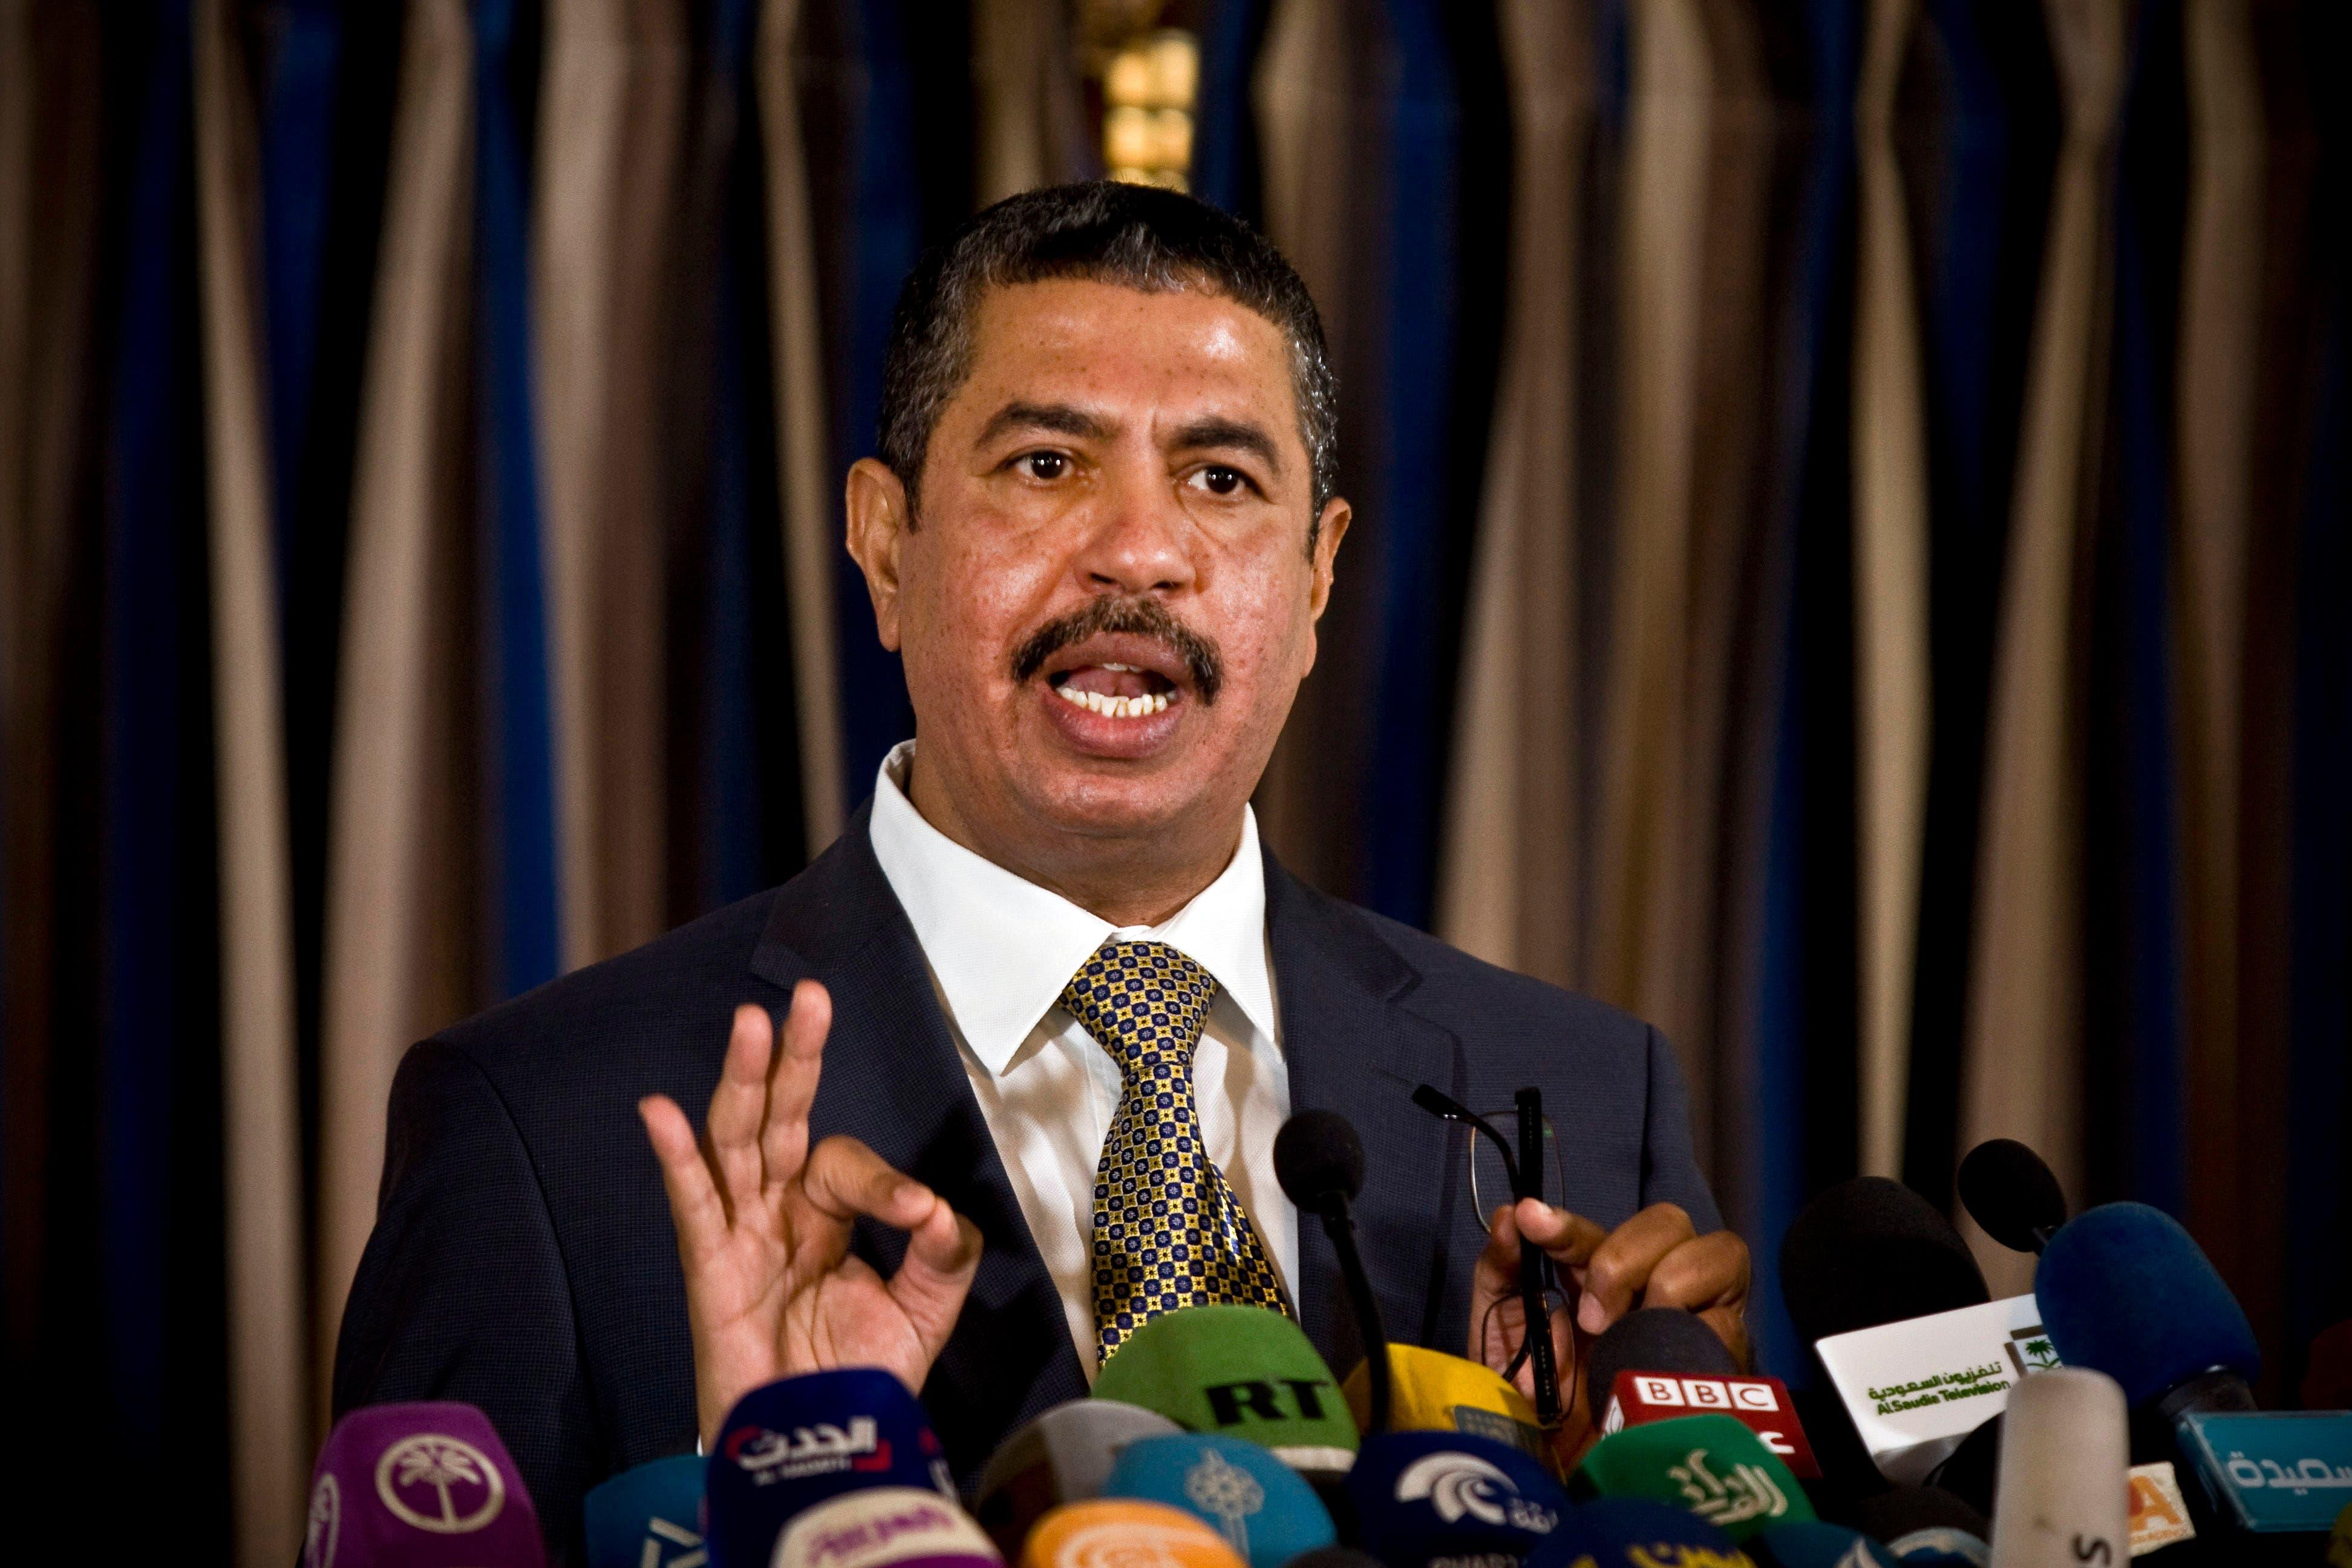 Yemen's new Deputy President Khaled Bahah seen in this November 9, 2014 file photo. (AP)